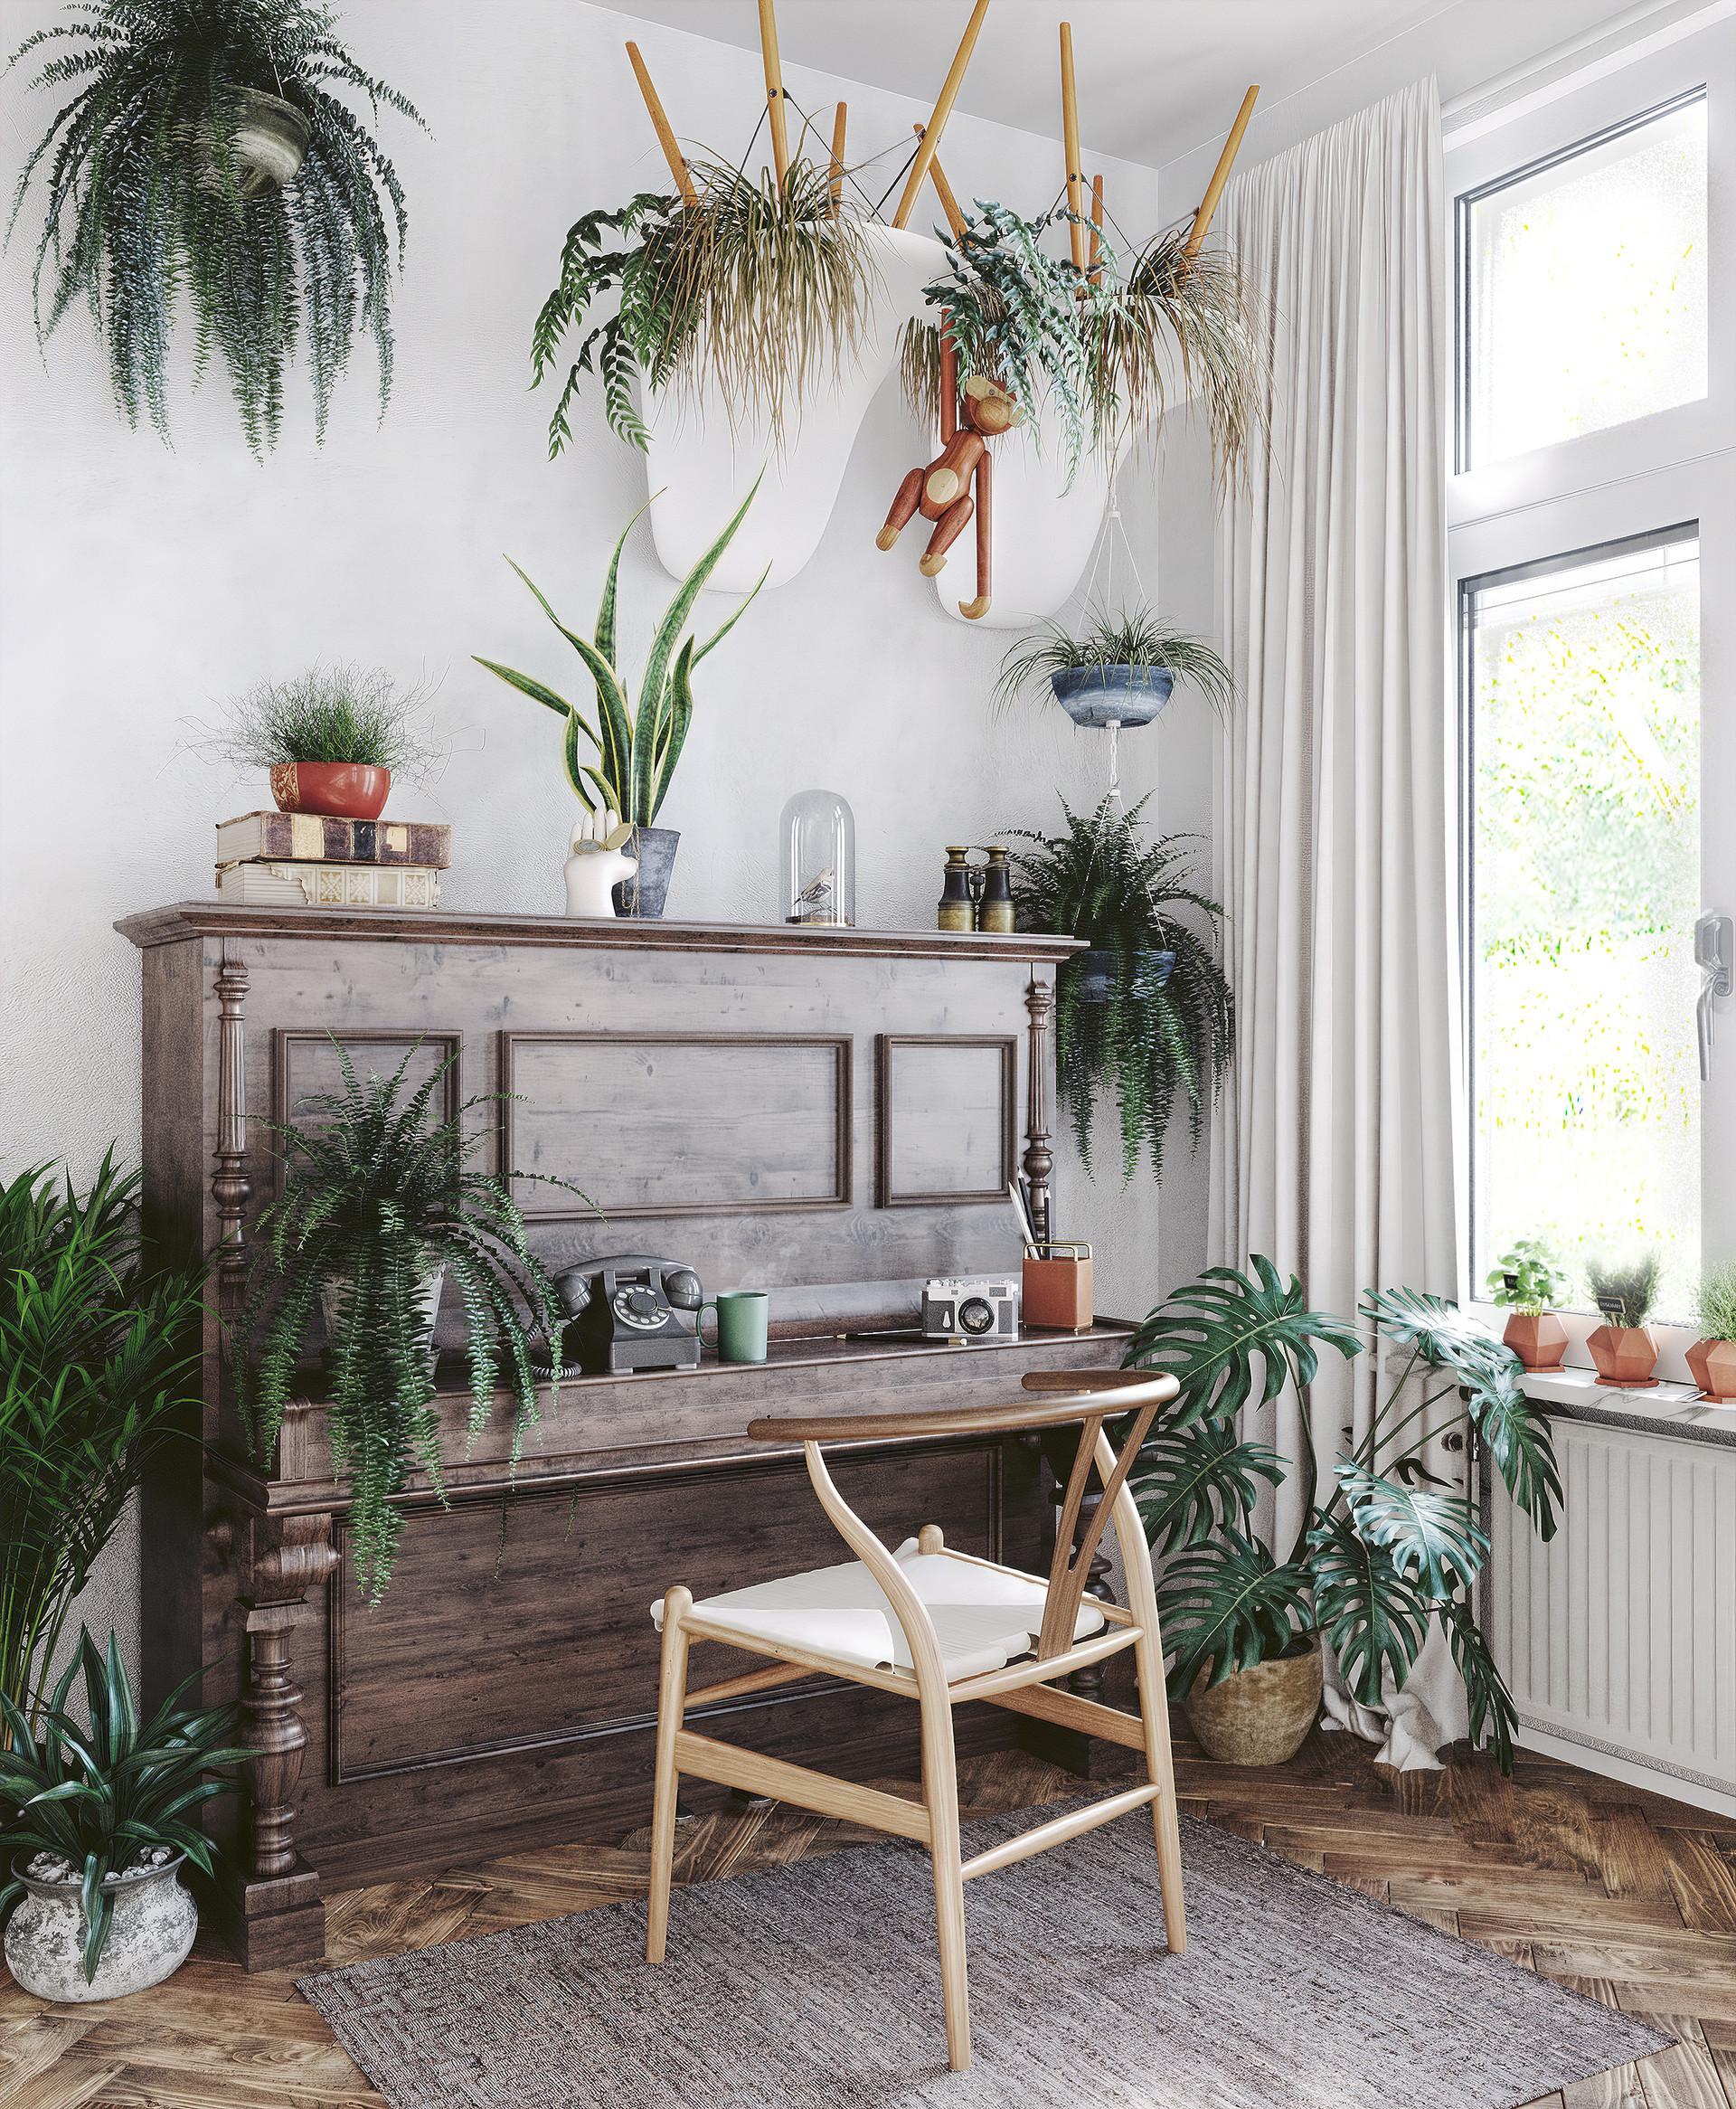 Mx lind nicolaisen indoorgarden 3